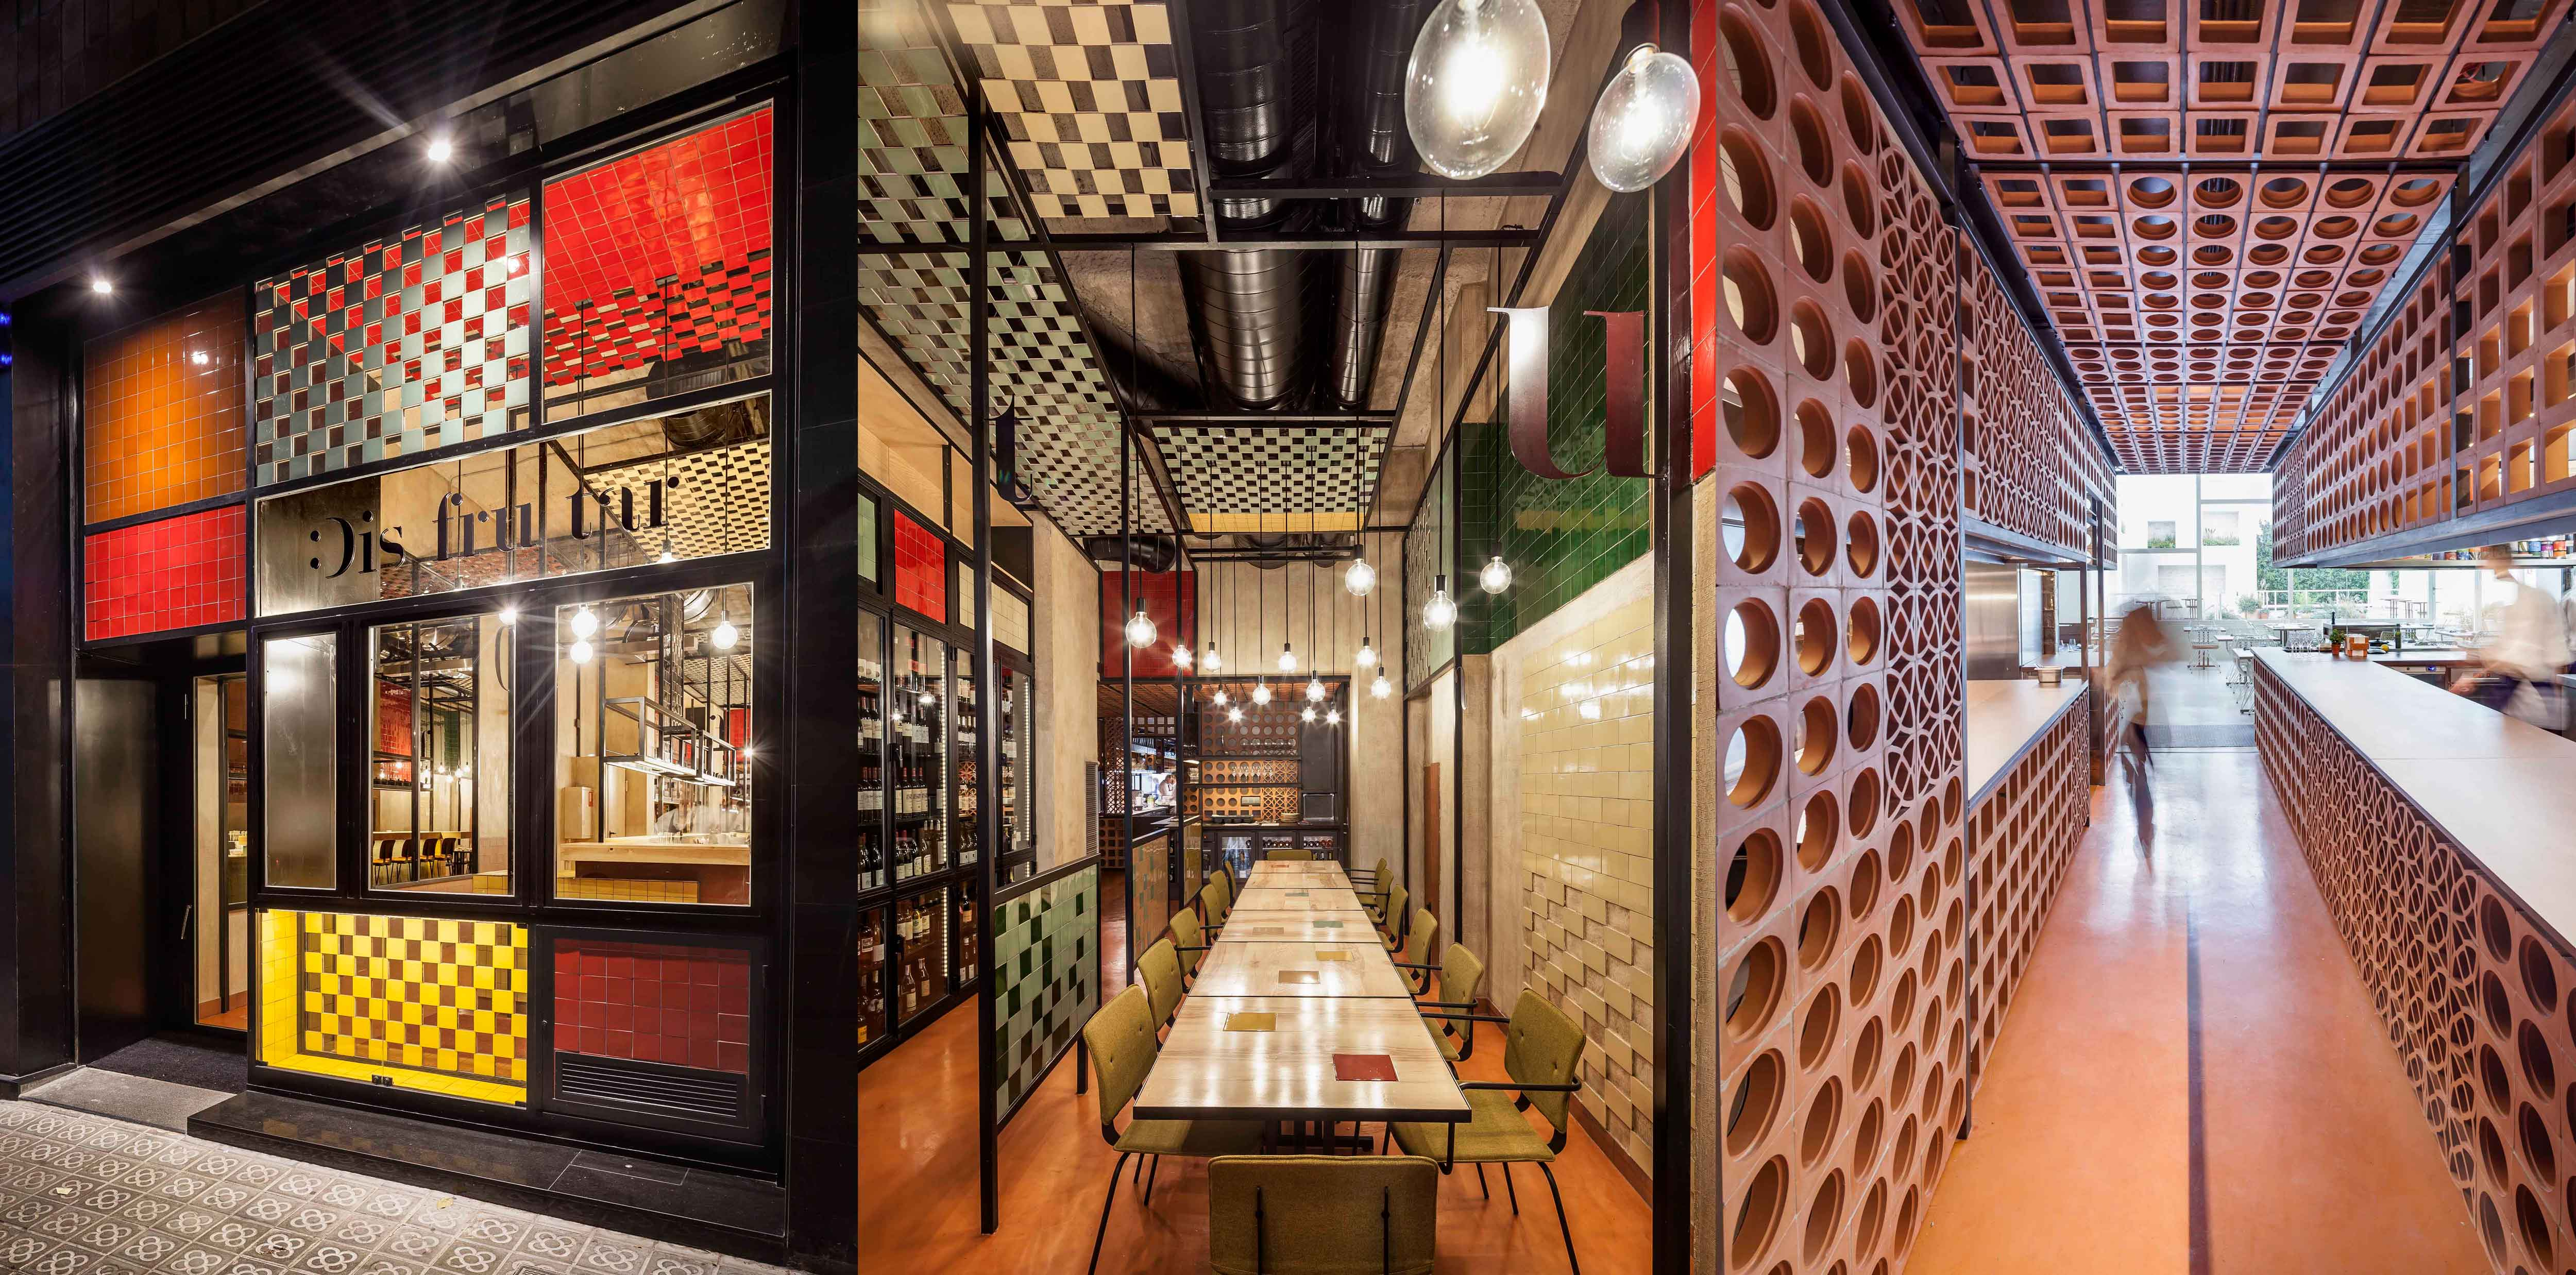 Restaurant Disfrutar - Barcelone